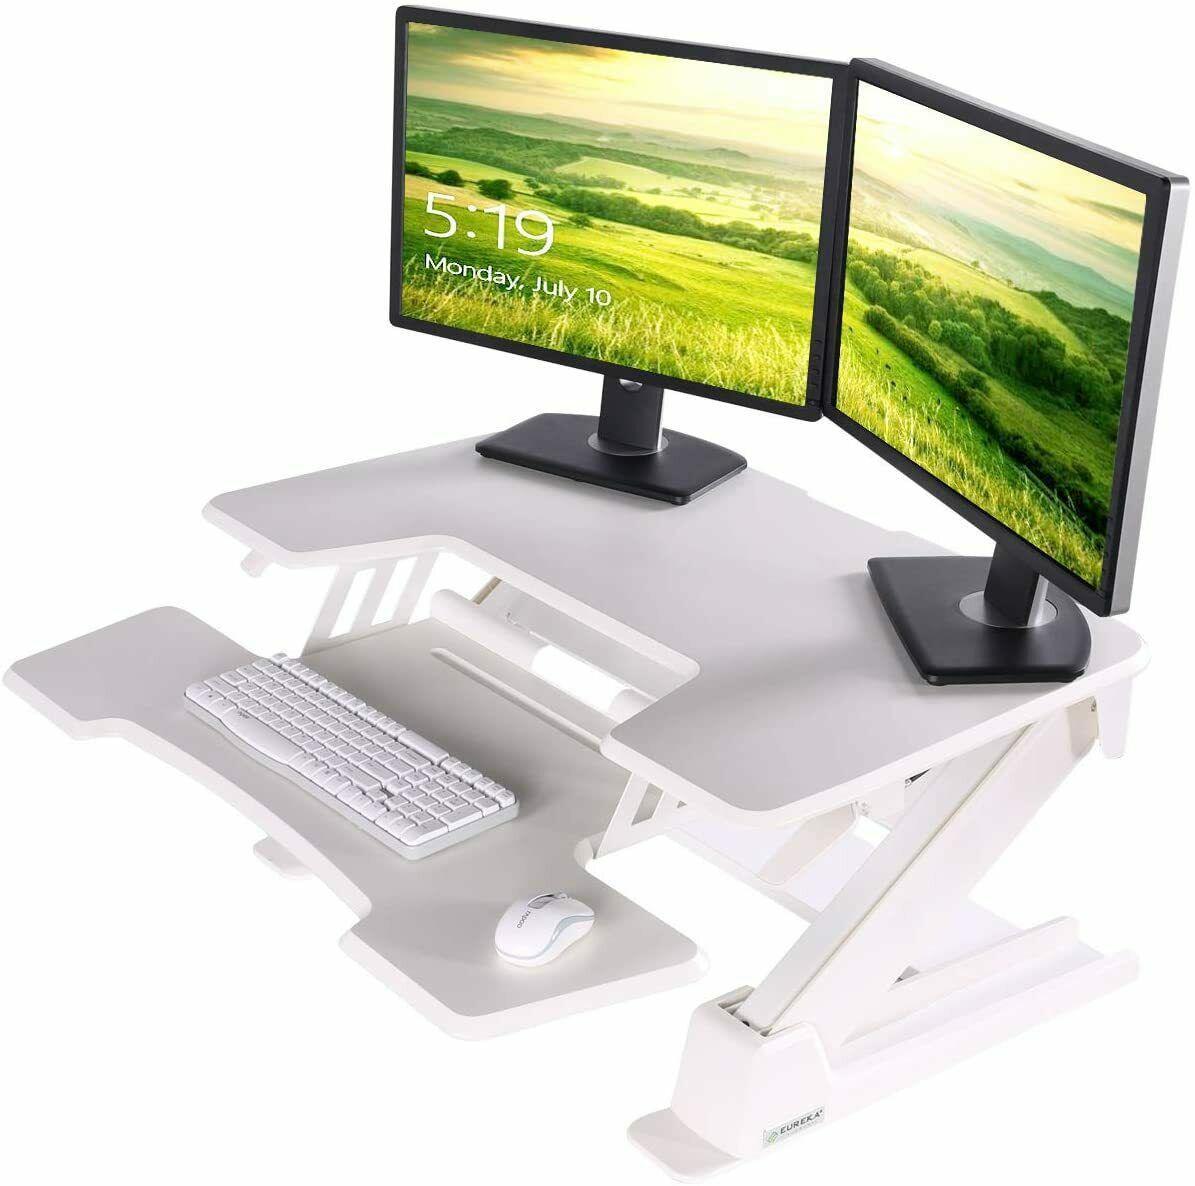 Picture of: Eureka Ergonomic Height Adjustable Desk 36 Sit Stand Desk Standing Desk Converter Riser With Keyboard Tray White 2nd Generation Matt Blatt